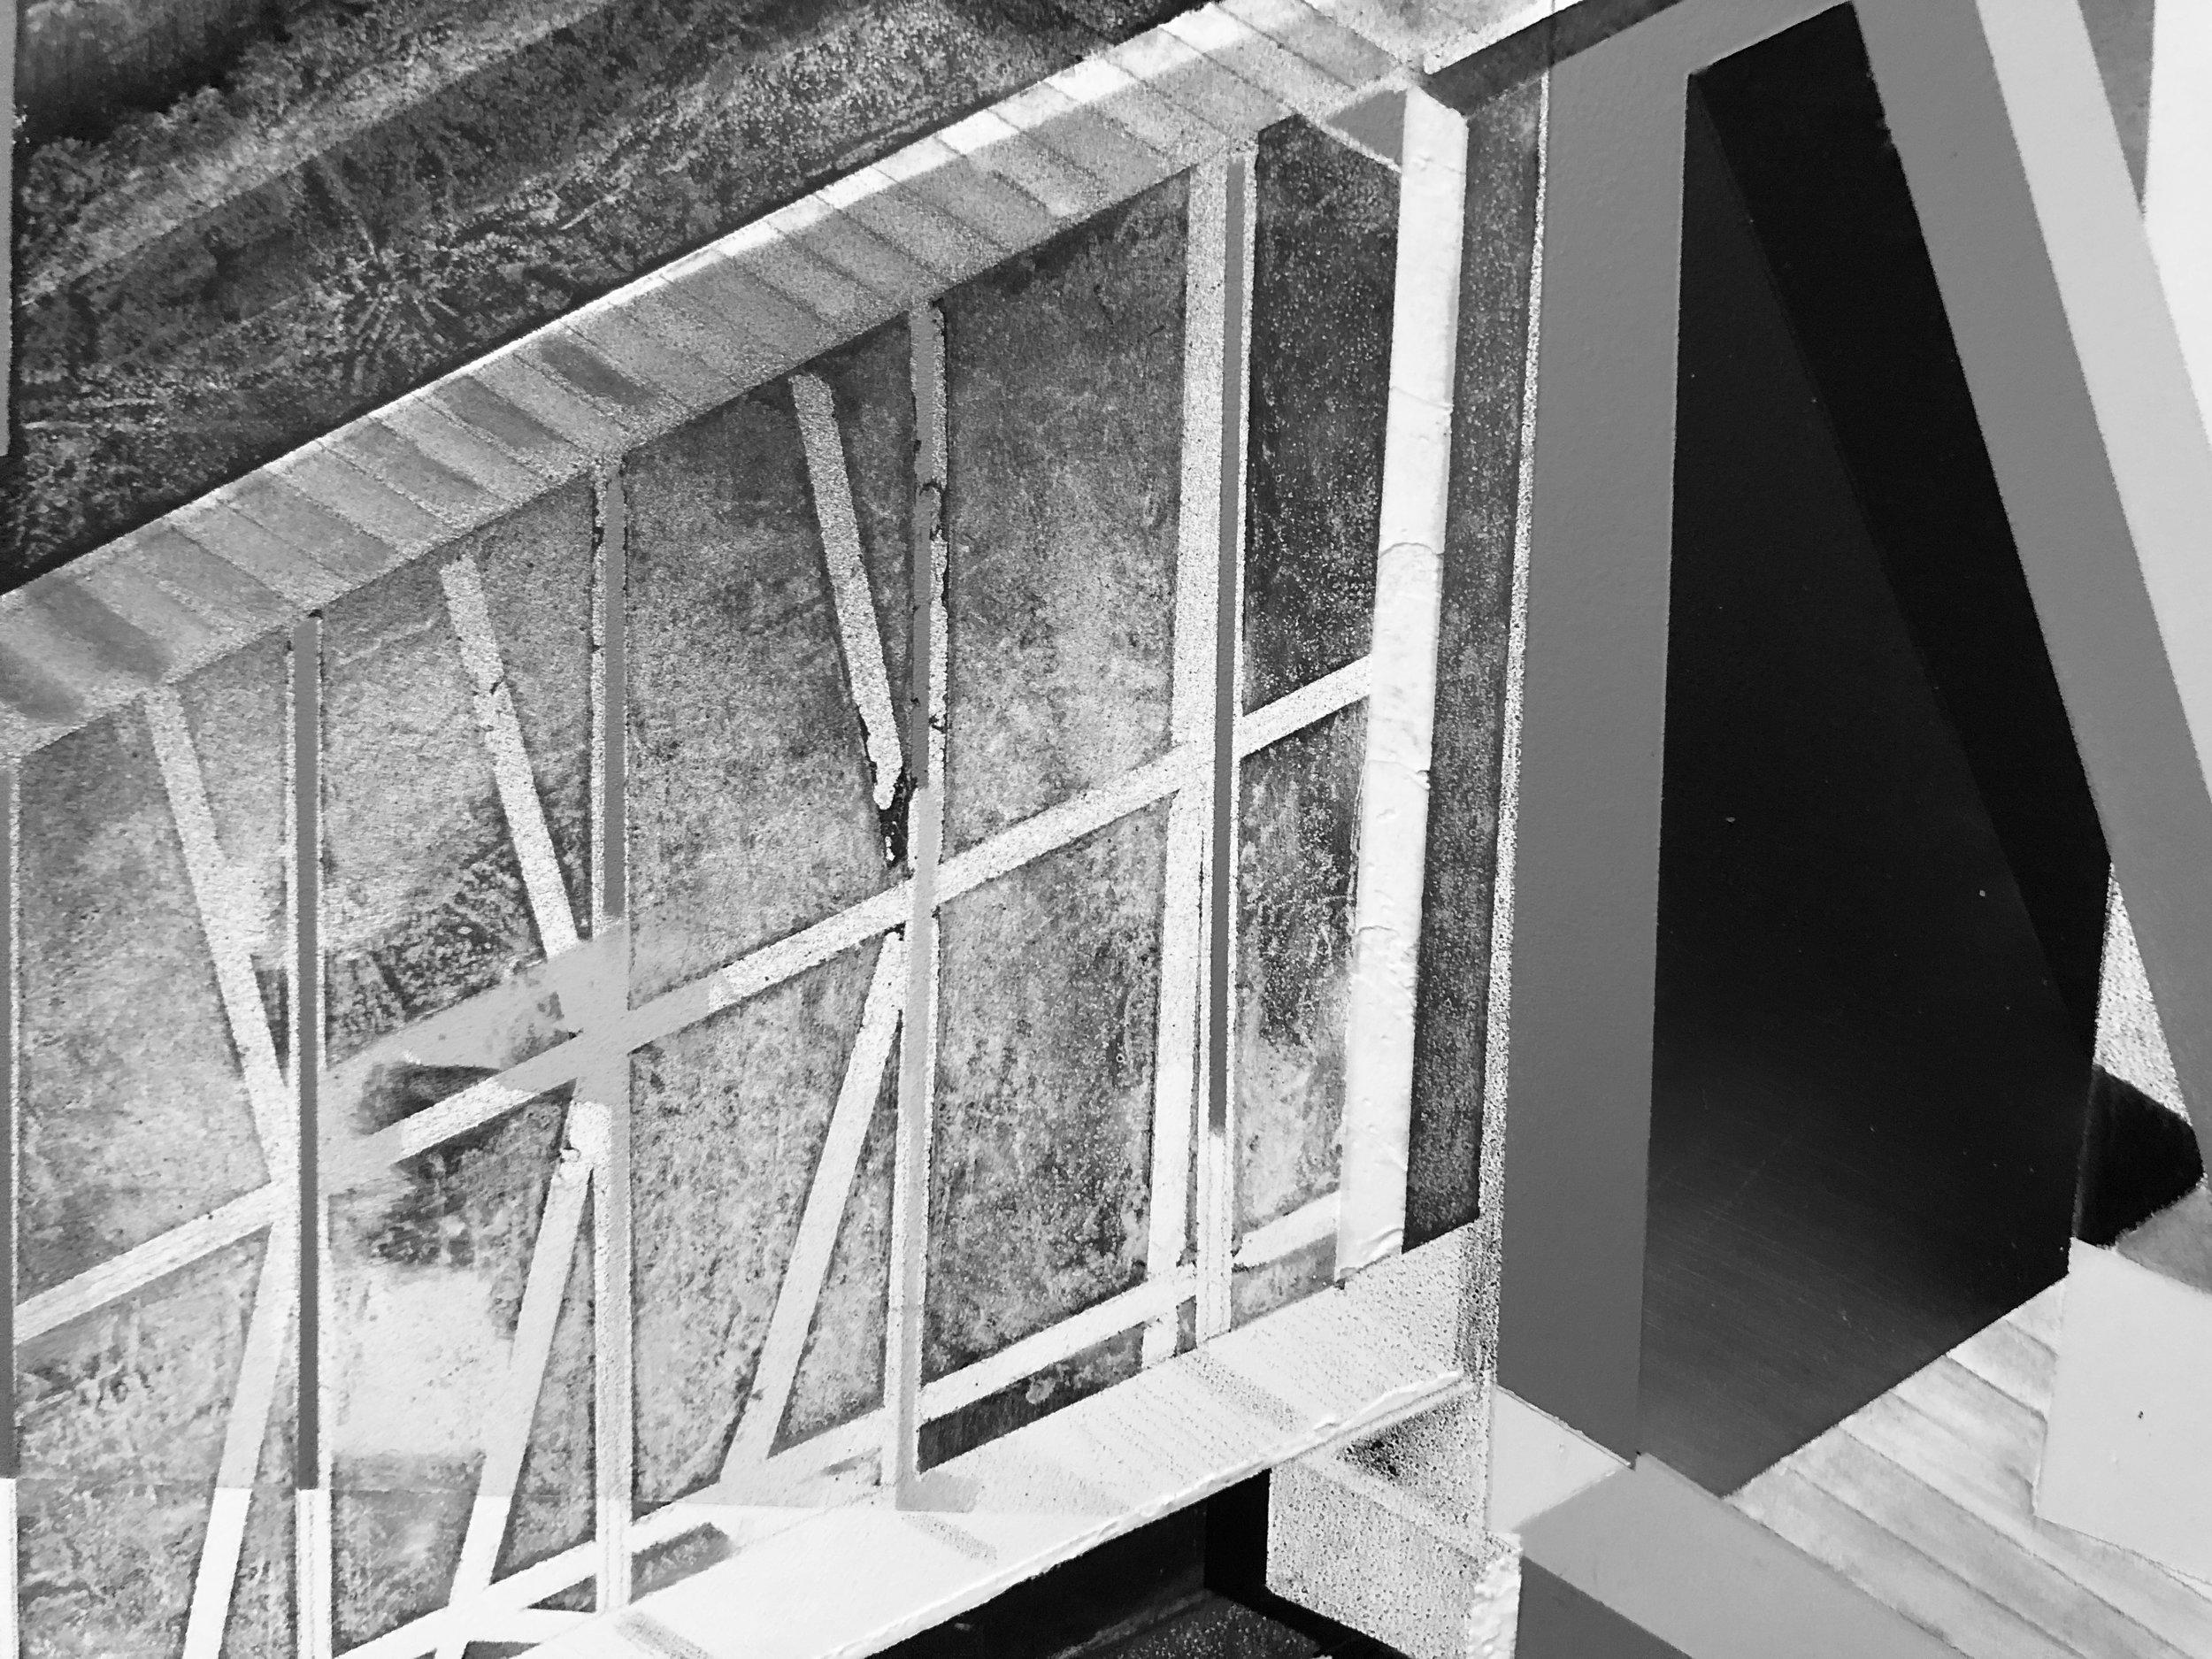 Amir-Hariri-Studio-Visit-2018-architecture-Neesh3.JPG